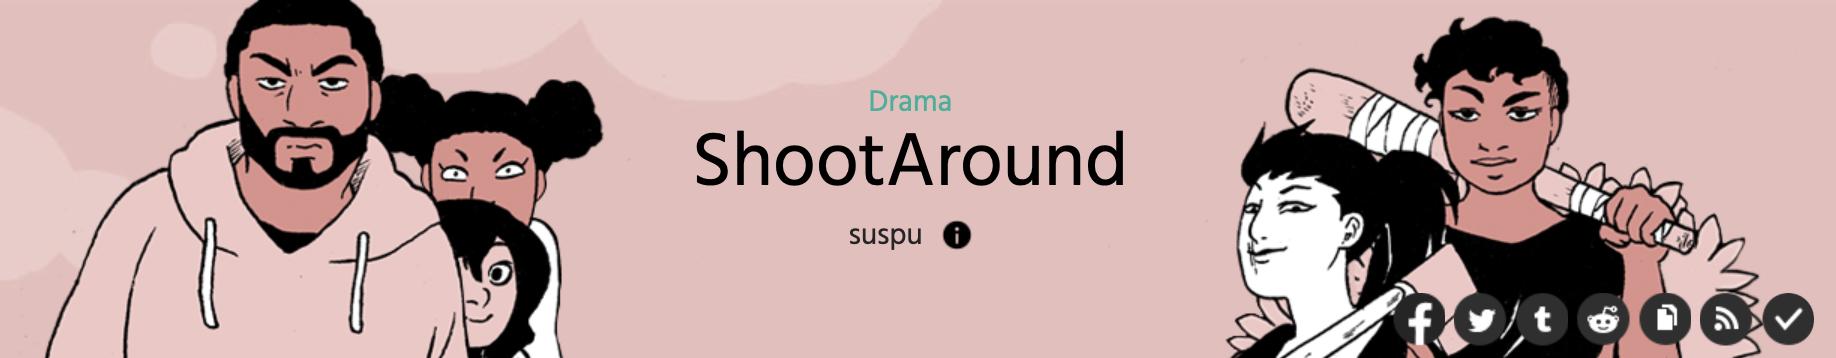 The cover image of ShootAround by suspu on Webtoons.